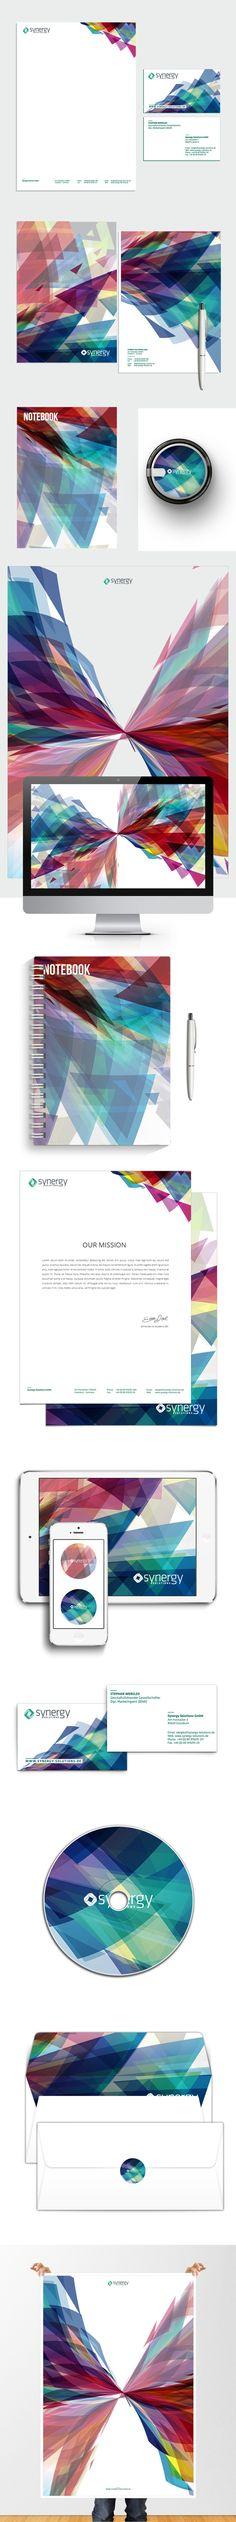 pinterest.com/fra411 #visual #identity - Synergy Branding by Firman Suci Ananda , via Behance